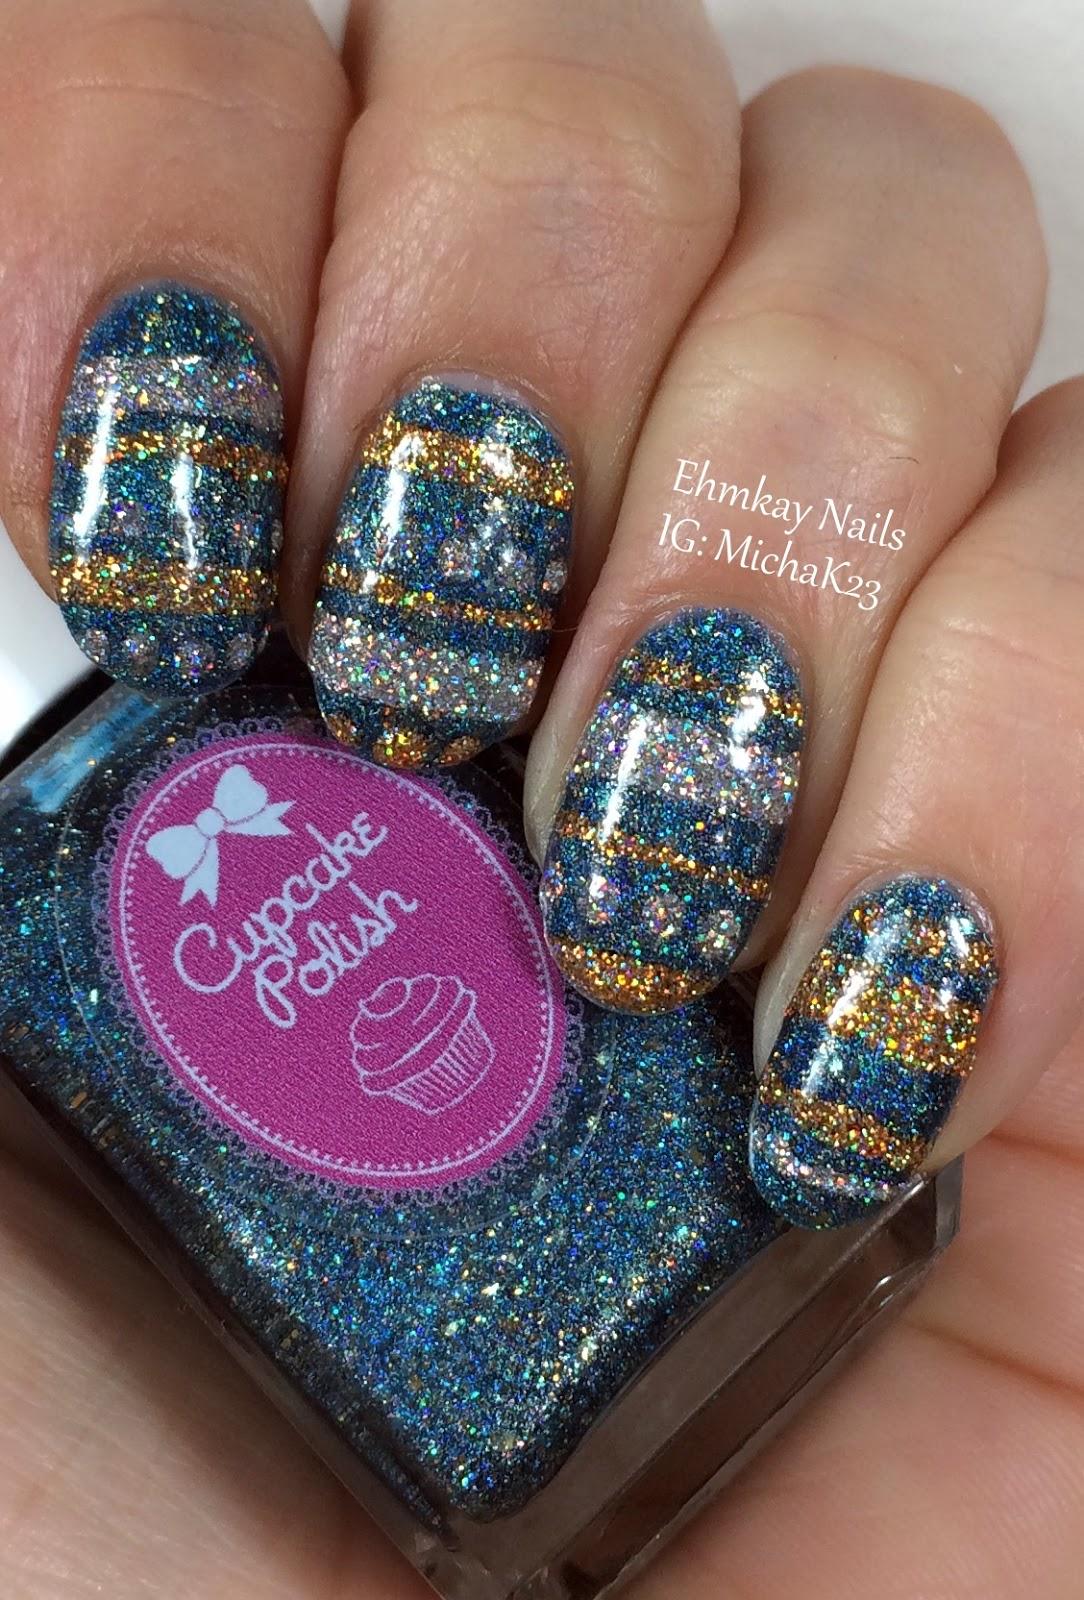 Ehmkay Nails: Chanukah Nail Art: Chanukah Ornaments